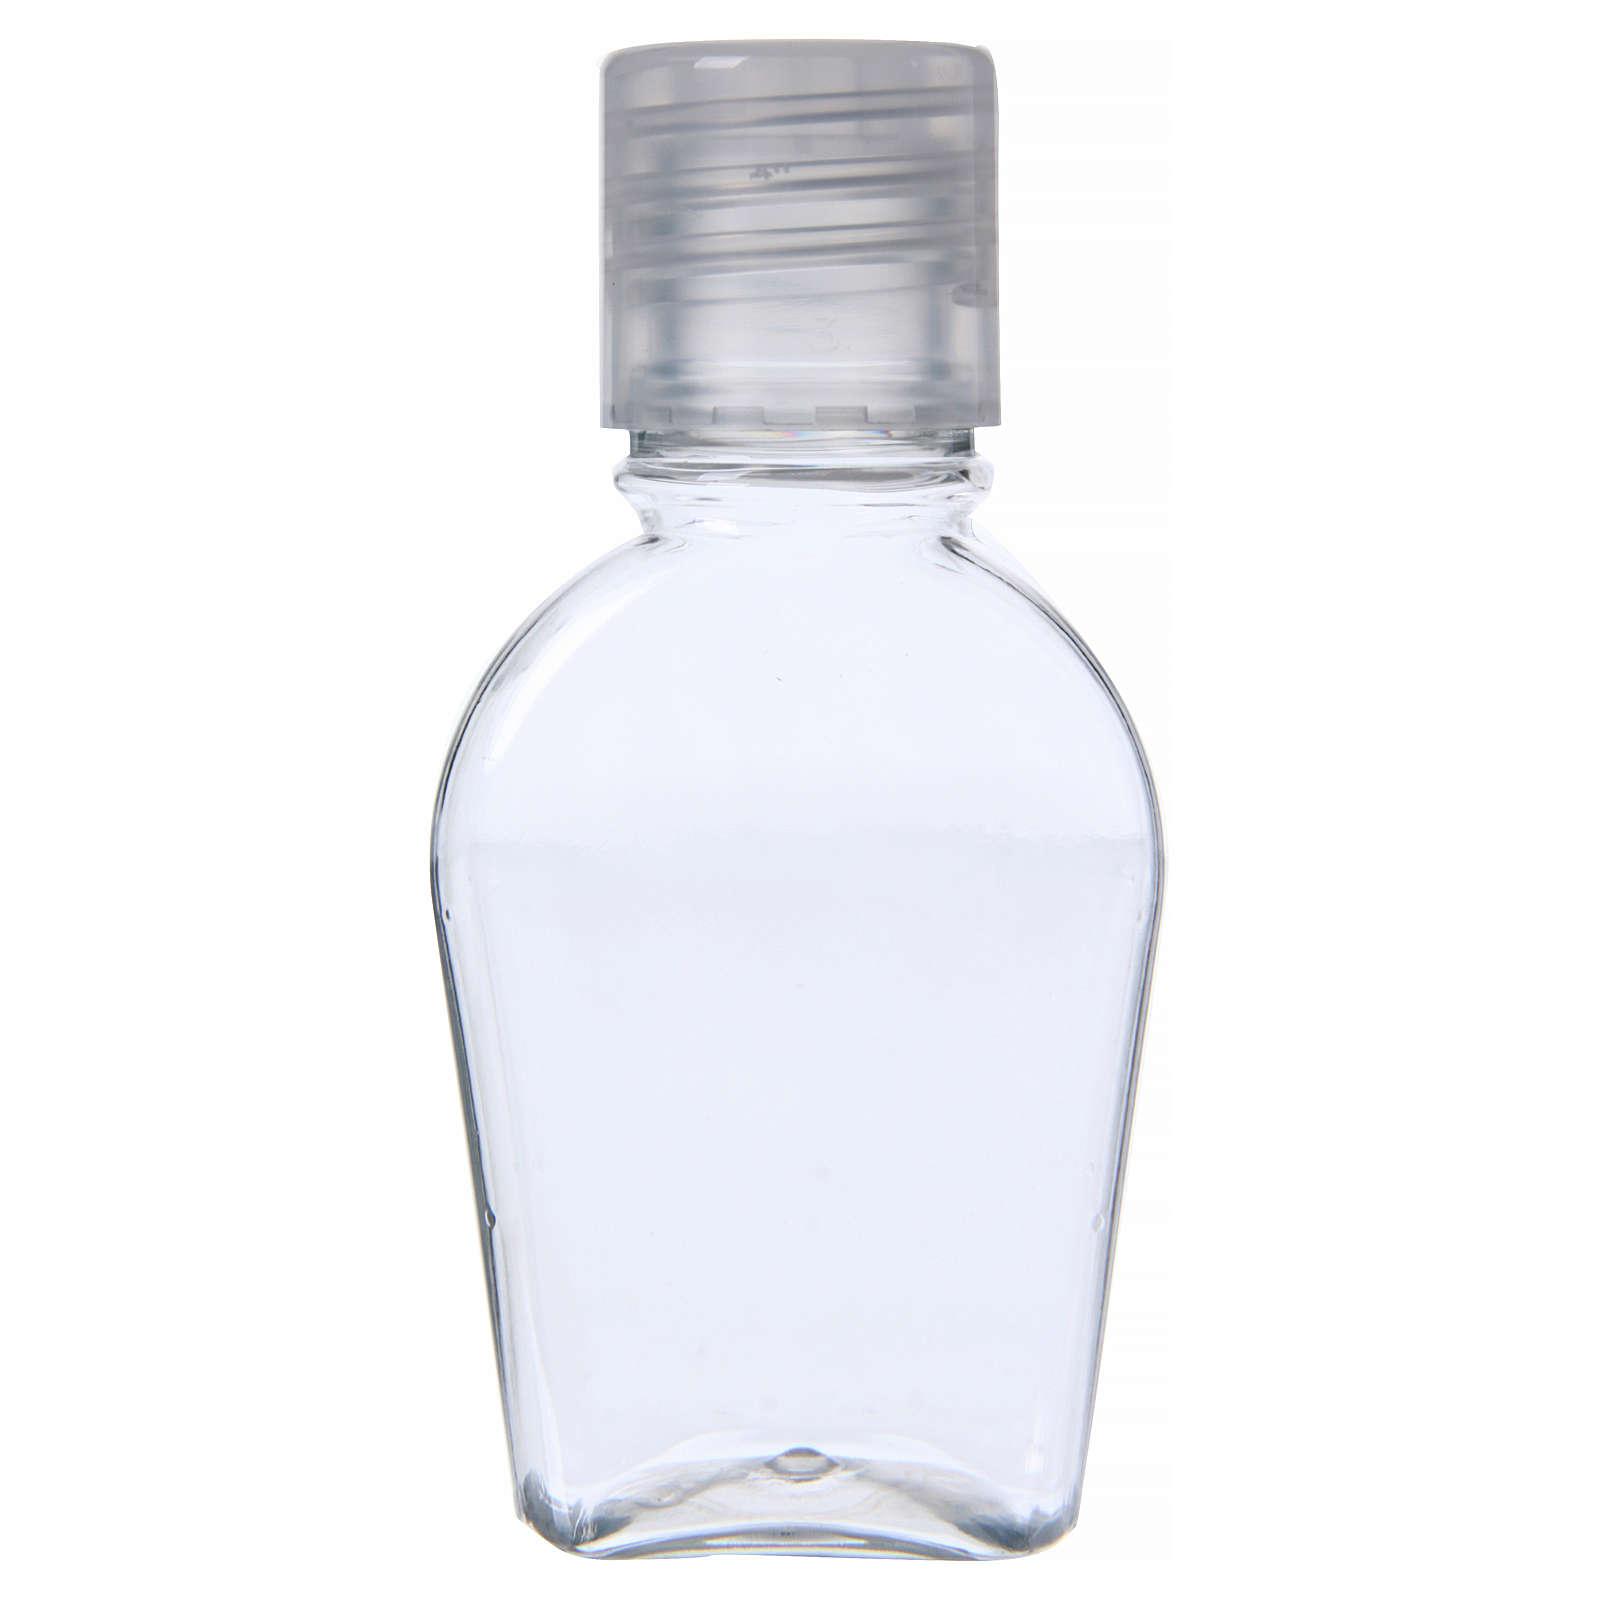 Botellas para agua bendita 30 ml caja 100 piezas 3